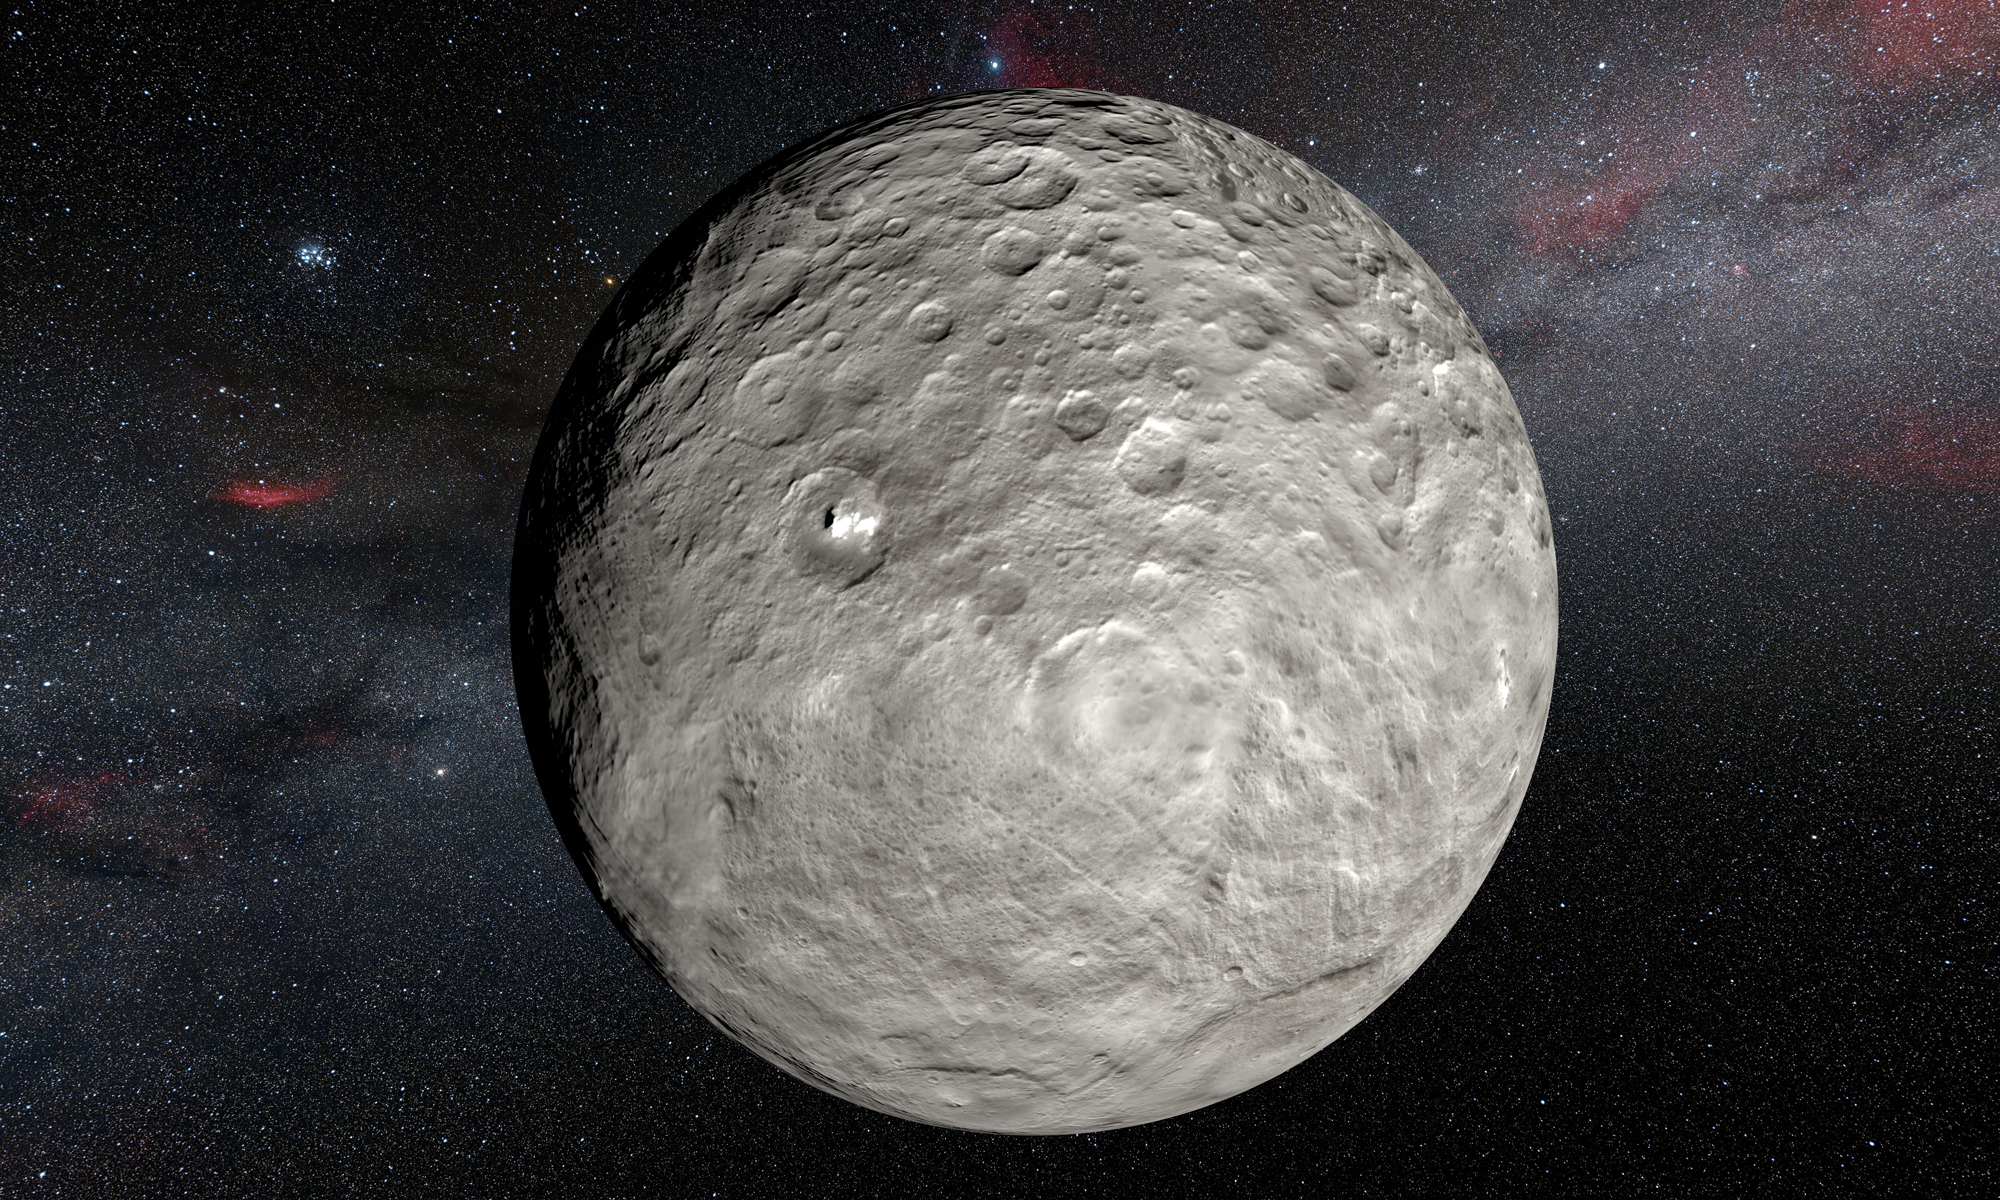 Photos: Dwarf Planet Ceres, the Solar System's Largest ...